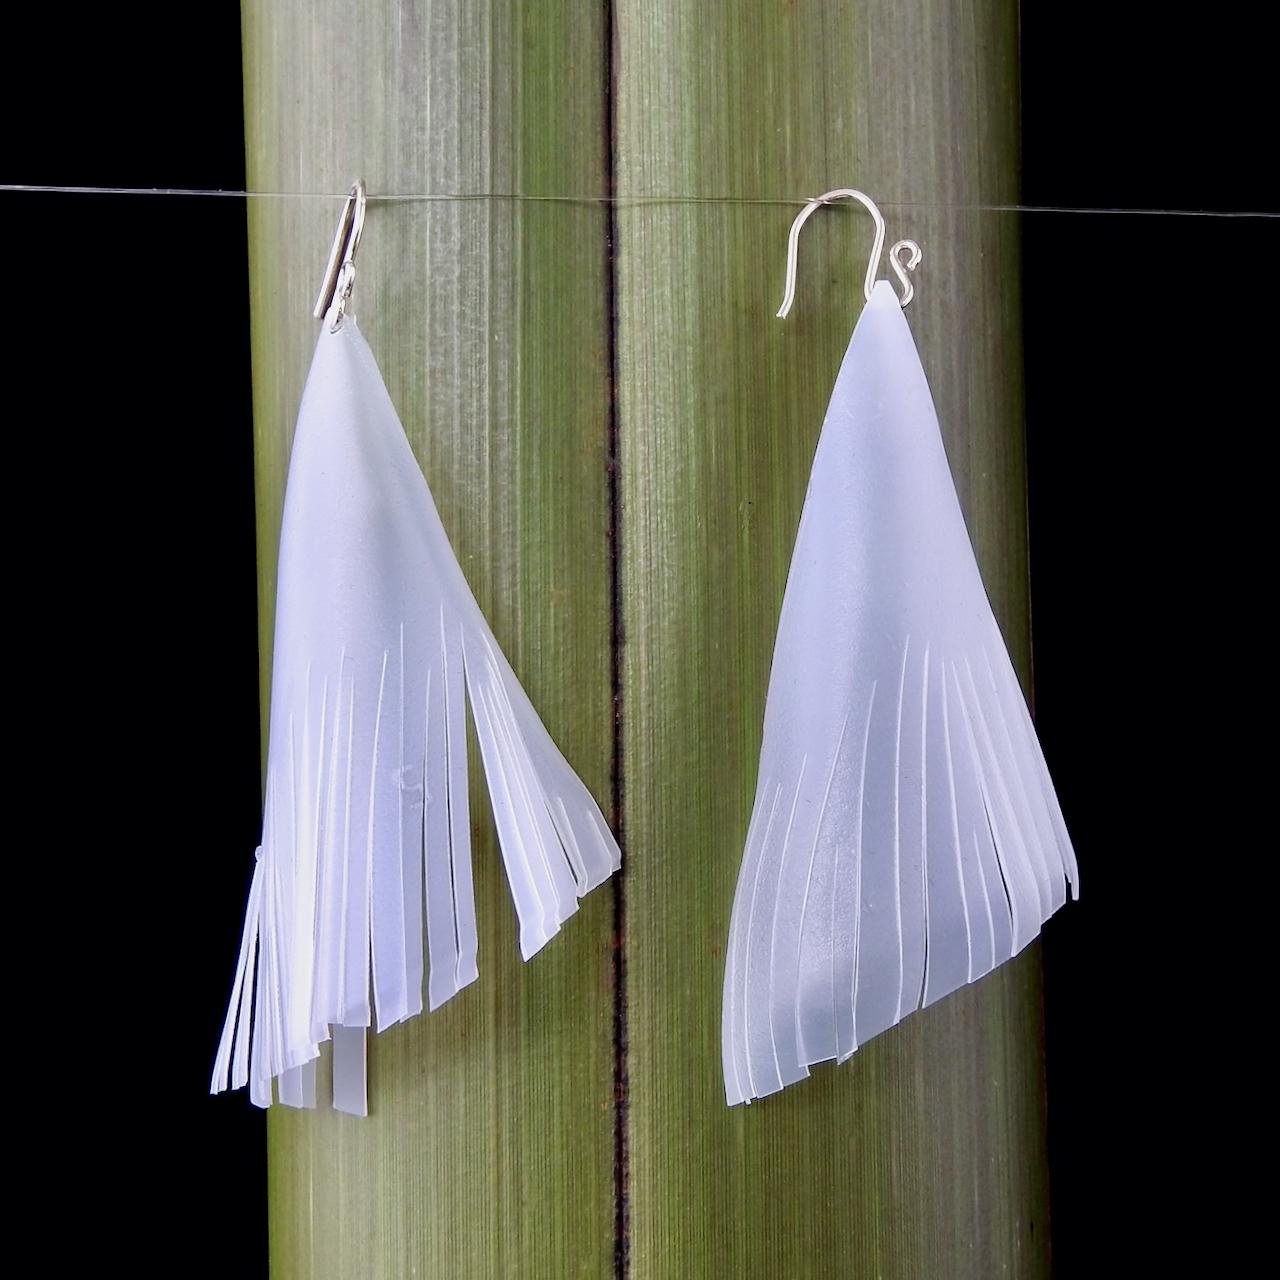 Long Tassel Earrings repurposed from milk bottles_Hanging against flax